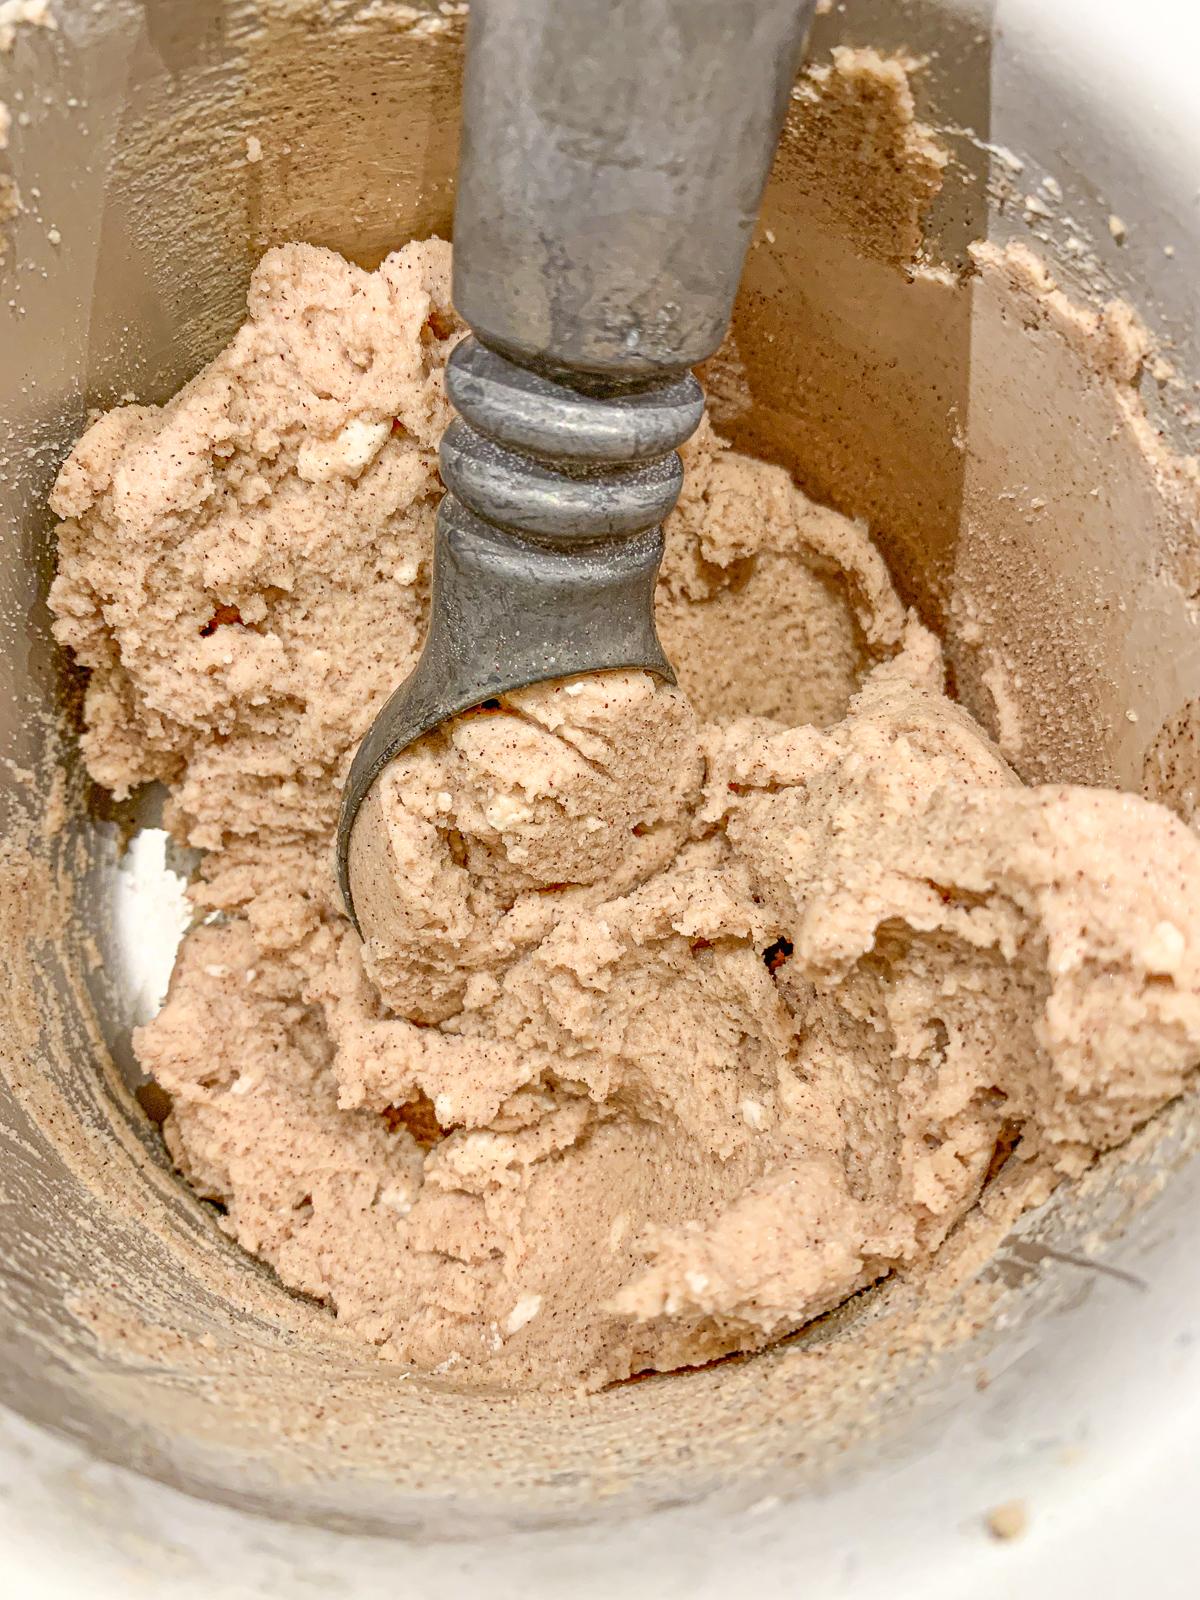 cinnamon roll, snickerdoodle, ice cream, vegan, dairy free, plant based, homemade, dessert, healthy ice cream,